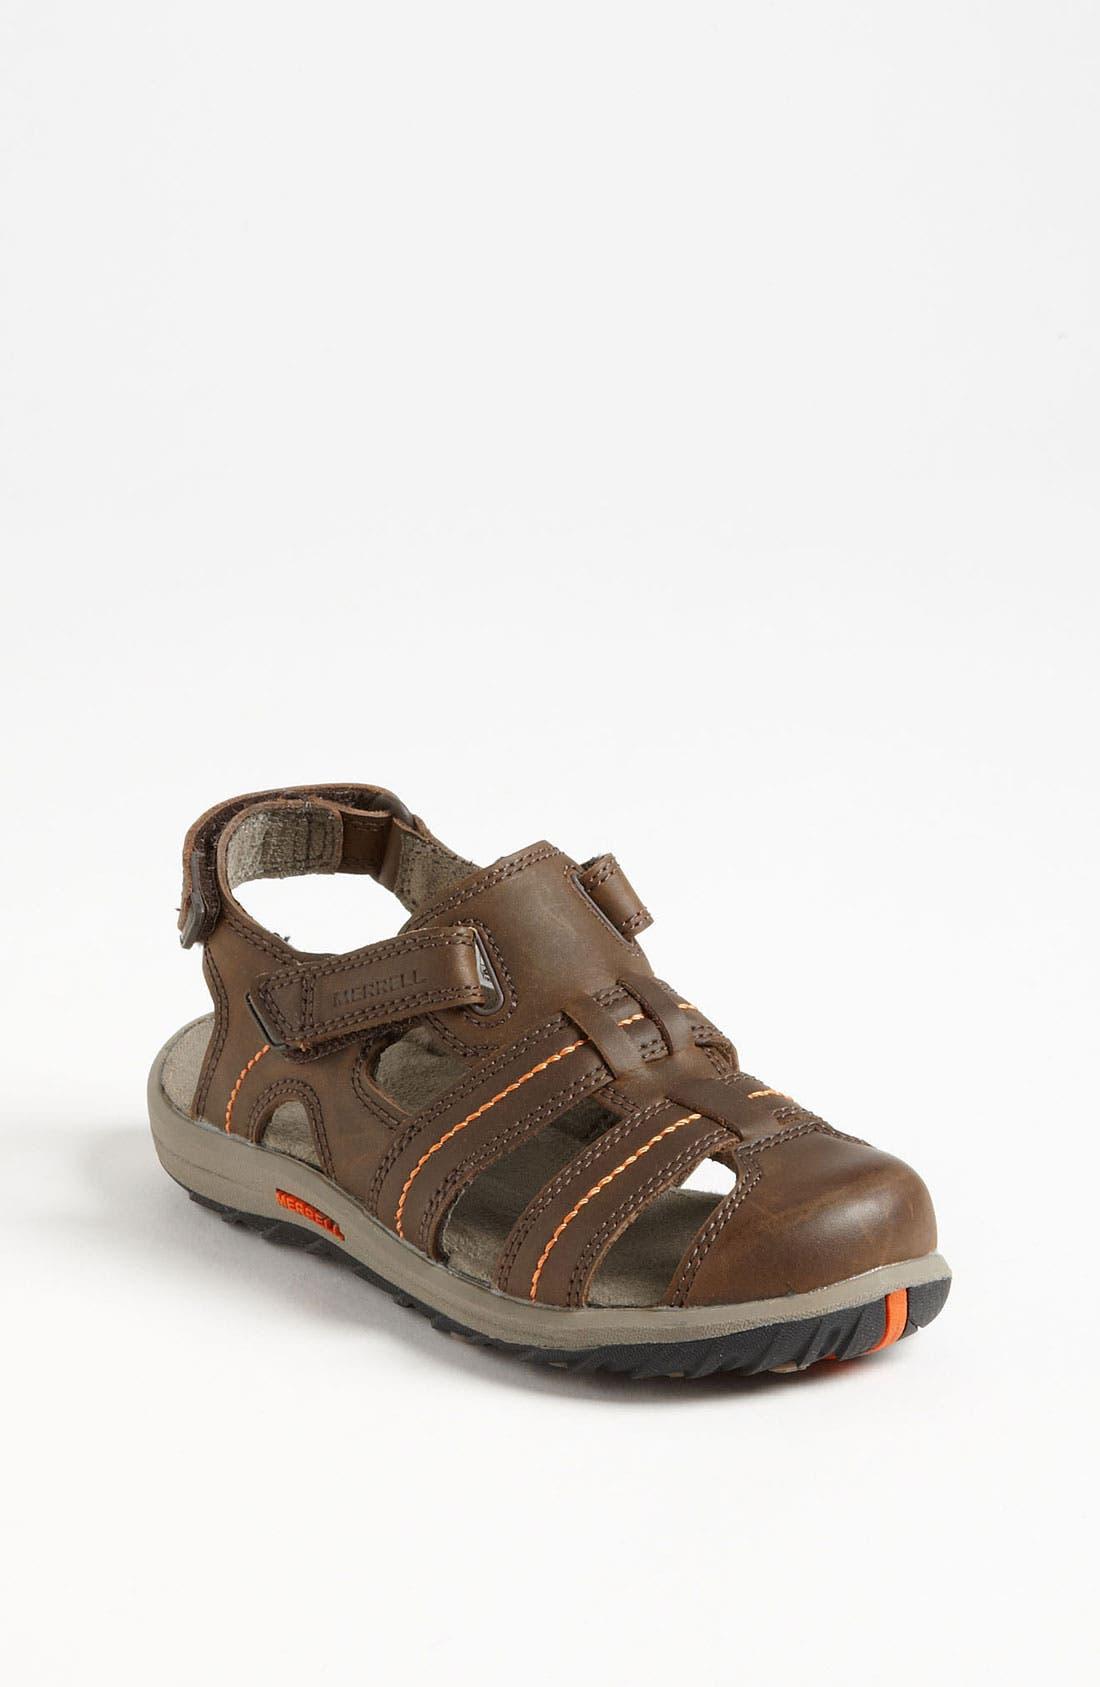 Main Image - Merrell 'Sidekick Deck' Sandal (Toddler, Little Kid & Big Kid)